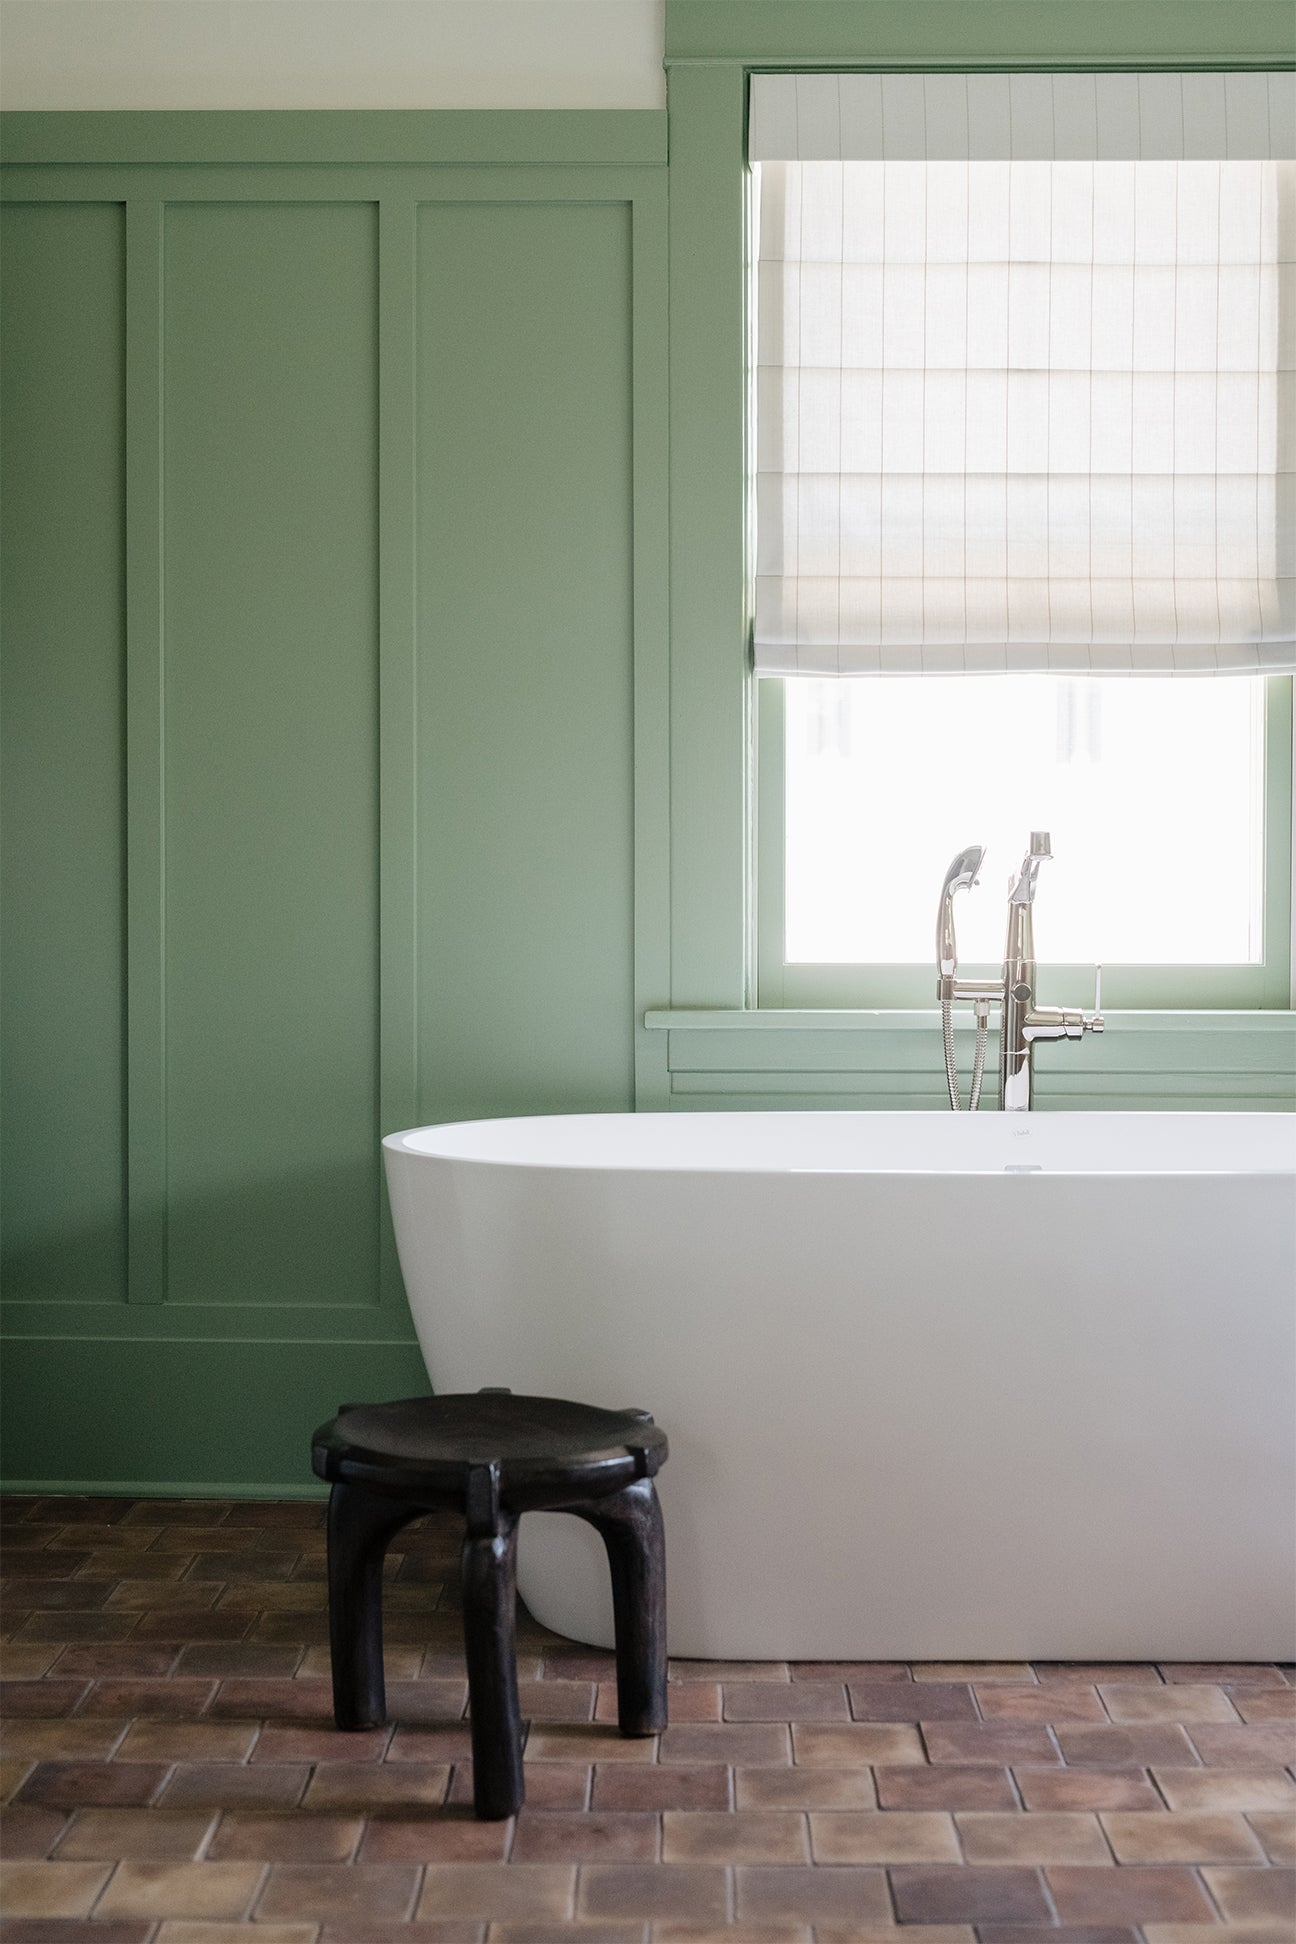 Green bedroom with soaking tub